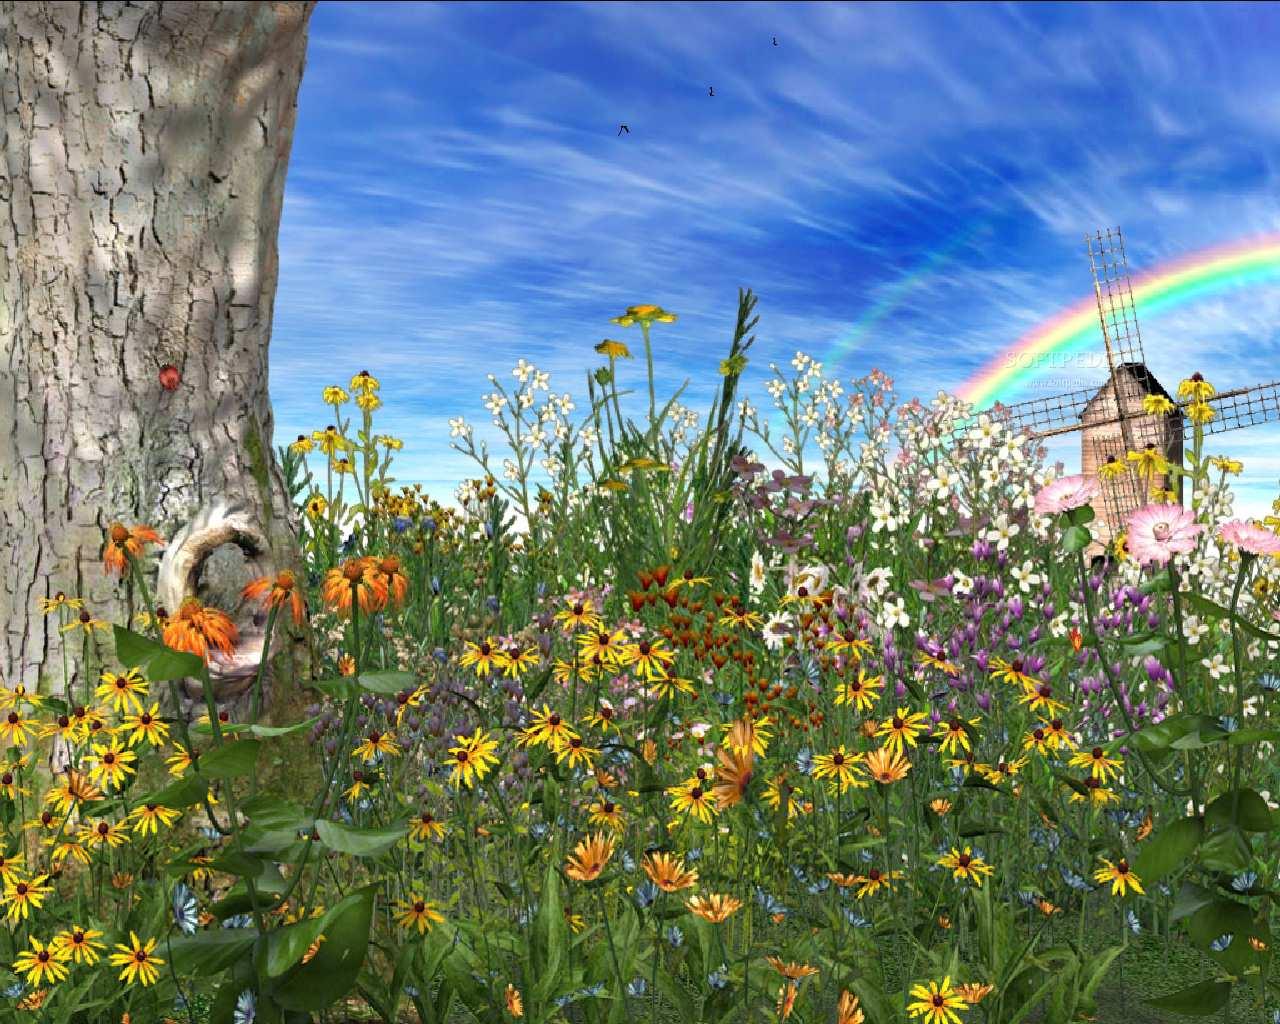 http://1.bp.blogspot.com/-vRPlwuUCrjA/UOcK7-fKpyI/AAAAAAAALnc/i4Mqc82agDM/s1600/Spring-Time-Animated-Wallpaper_1.jpg